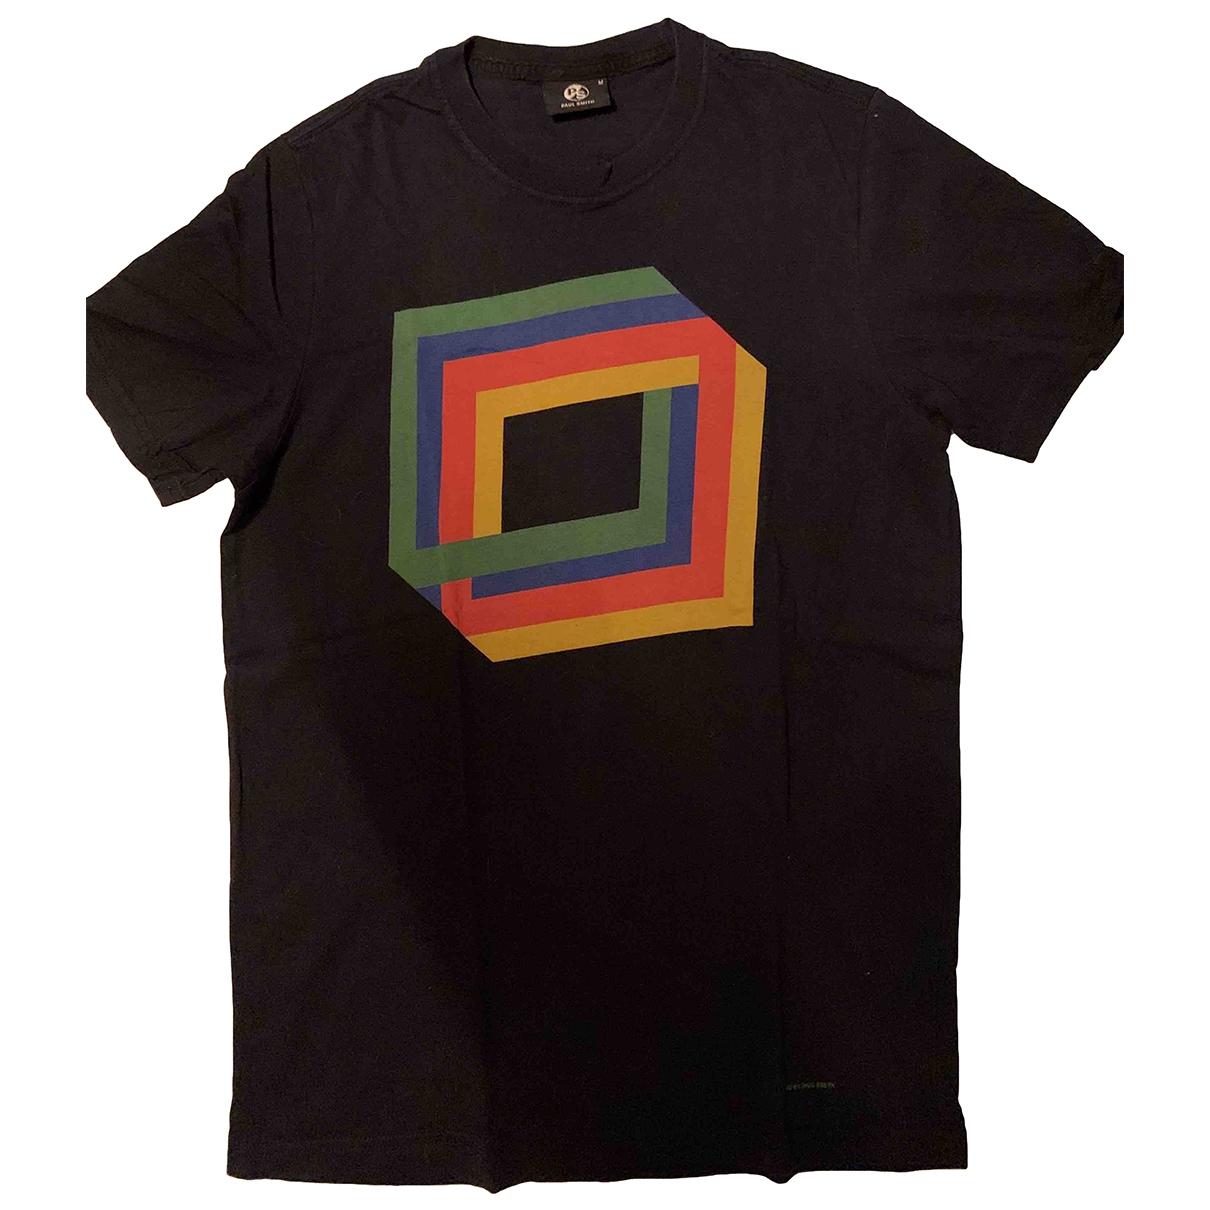 Paul Smith \N T-Shirts in  Schwarz Baumwolle